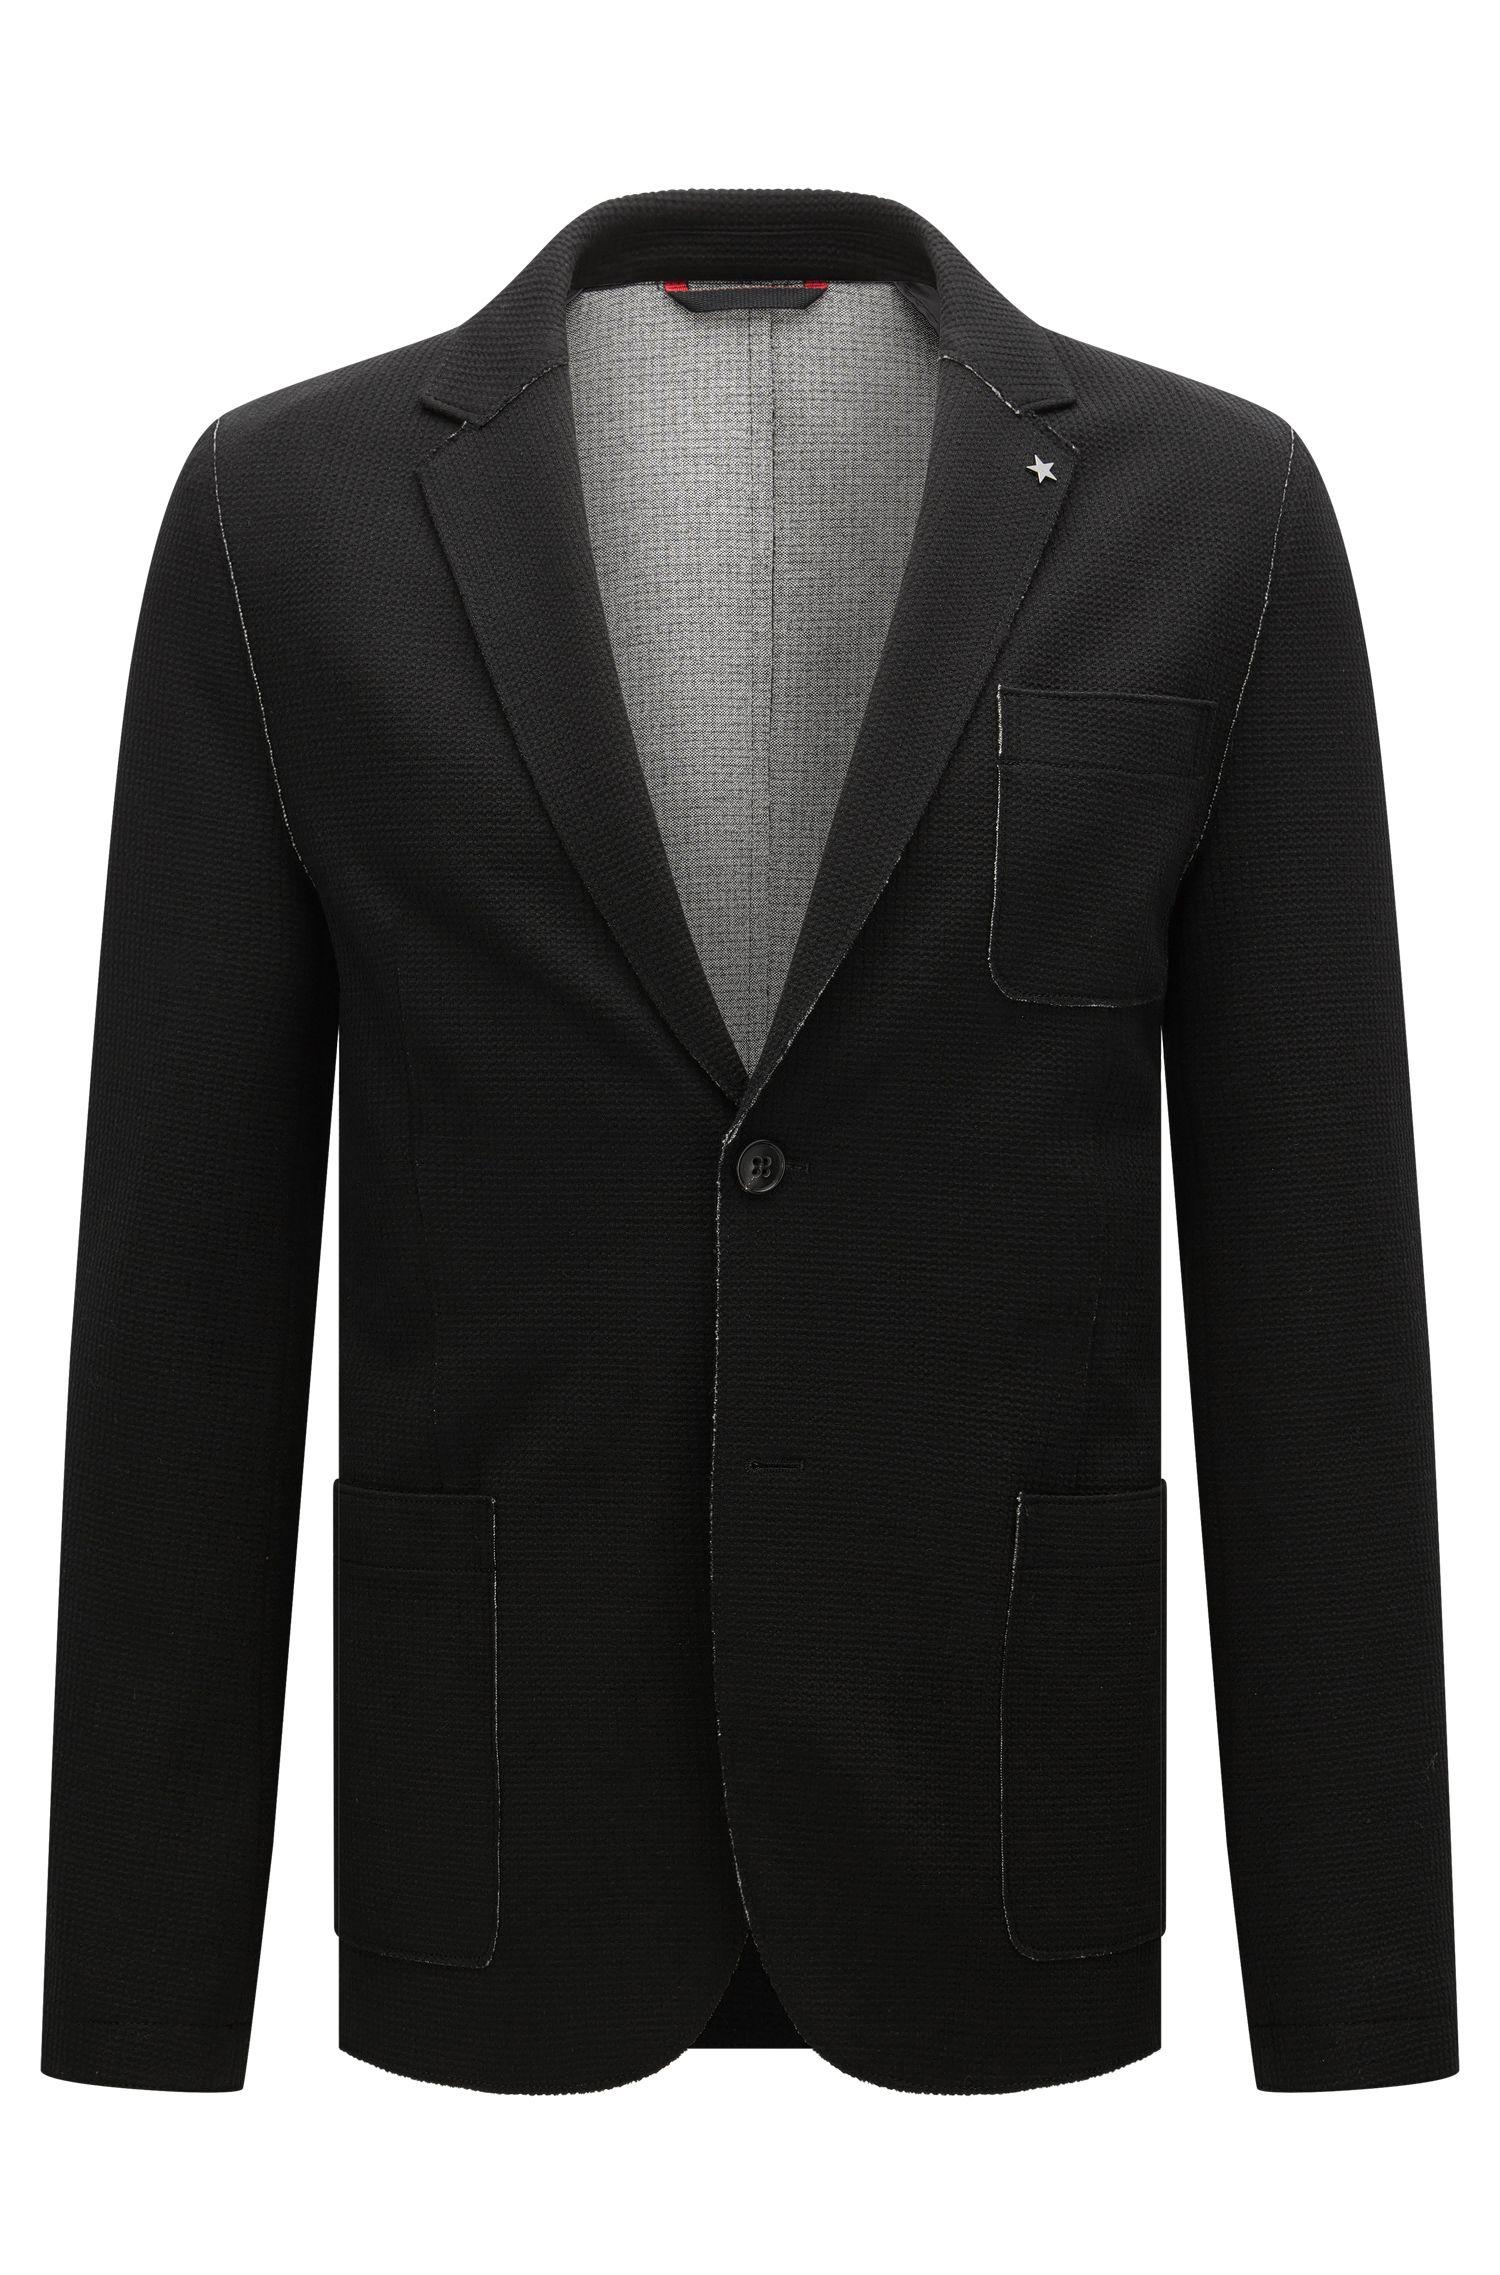 Waffle Knit Jersey Sport Coat, Slim Fit | Agalton